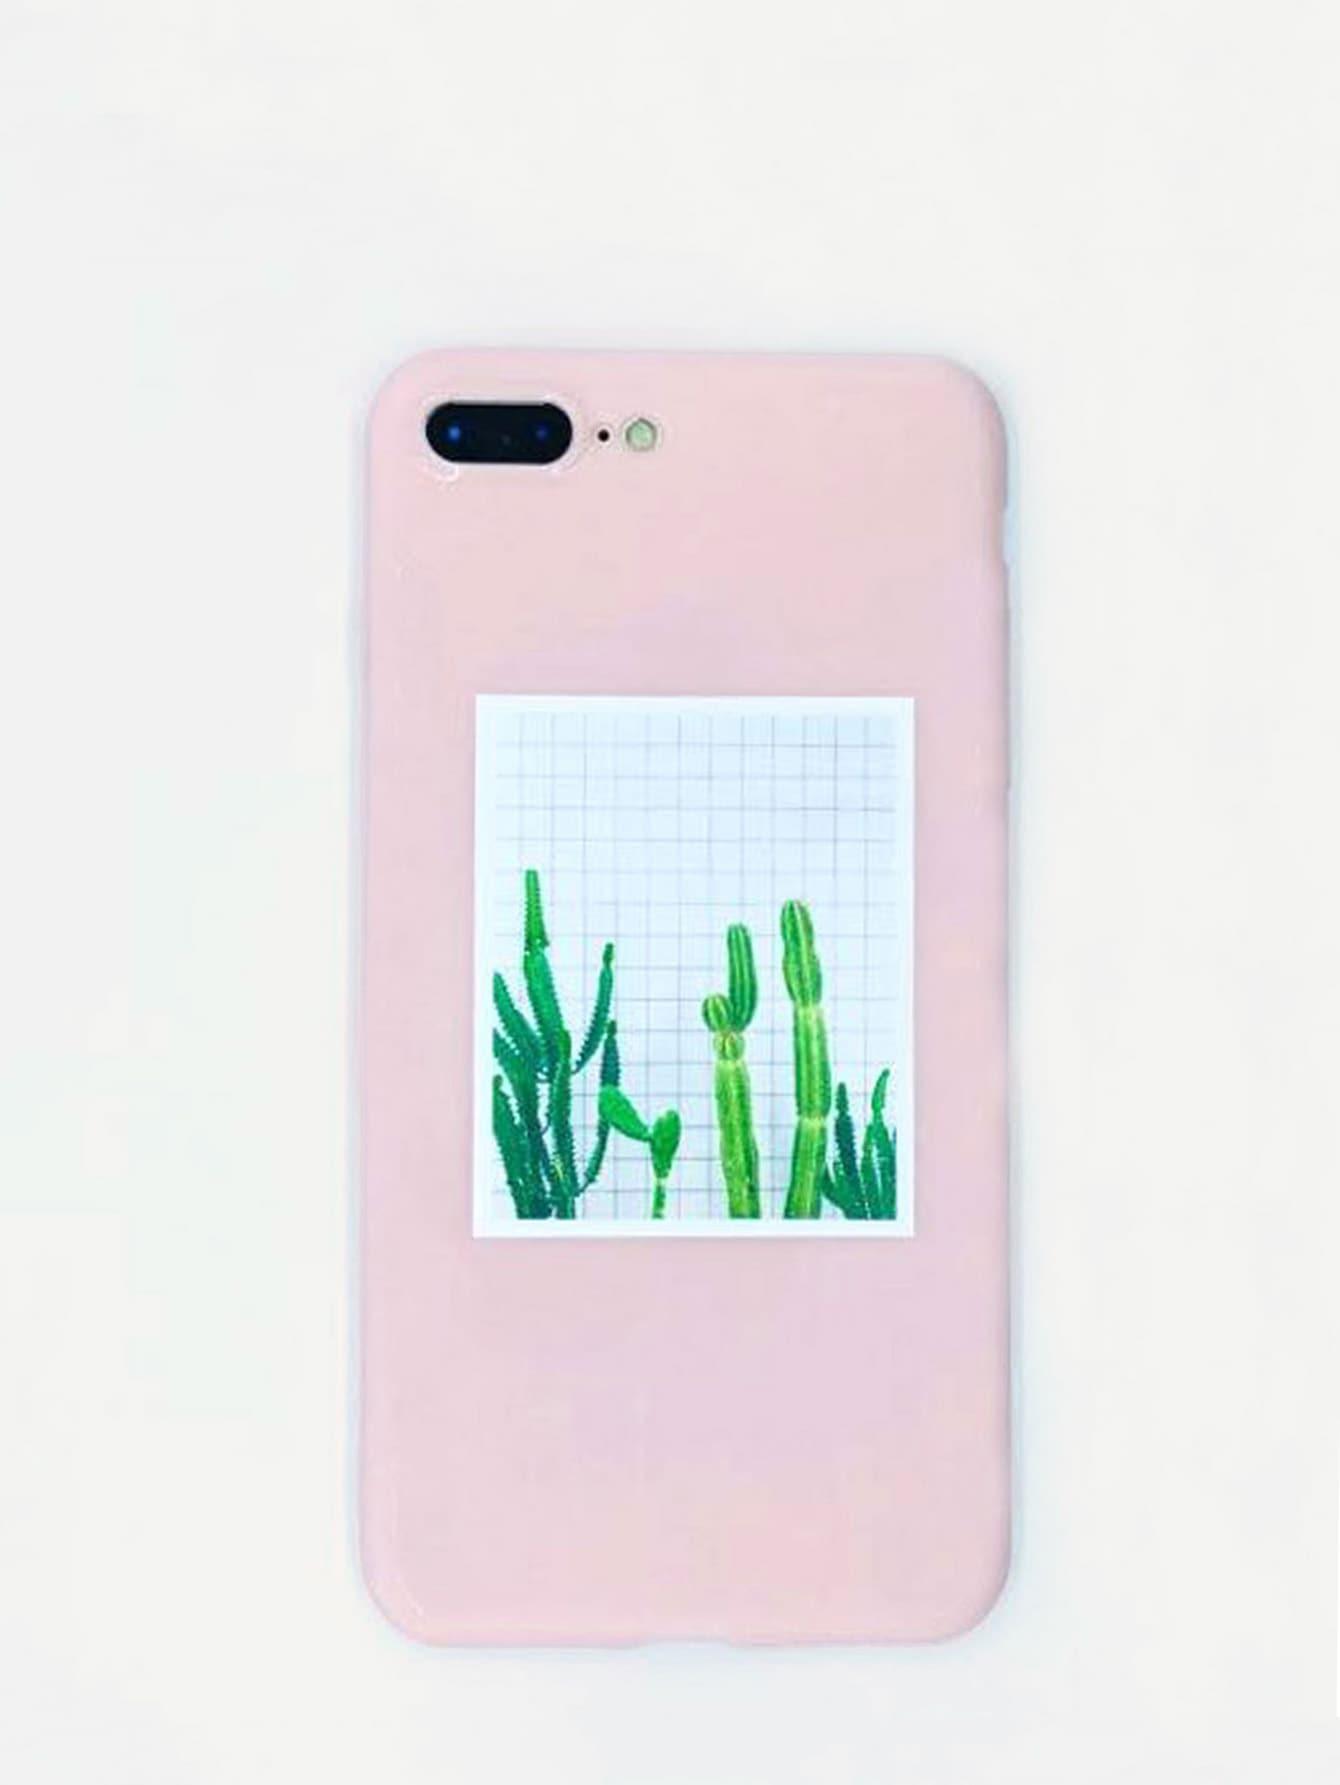 Cactus Print iPhone Case, null, SheIn  - купить со скидкой